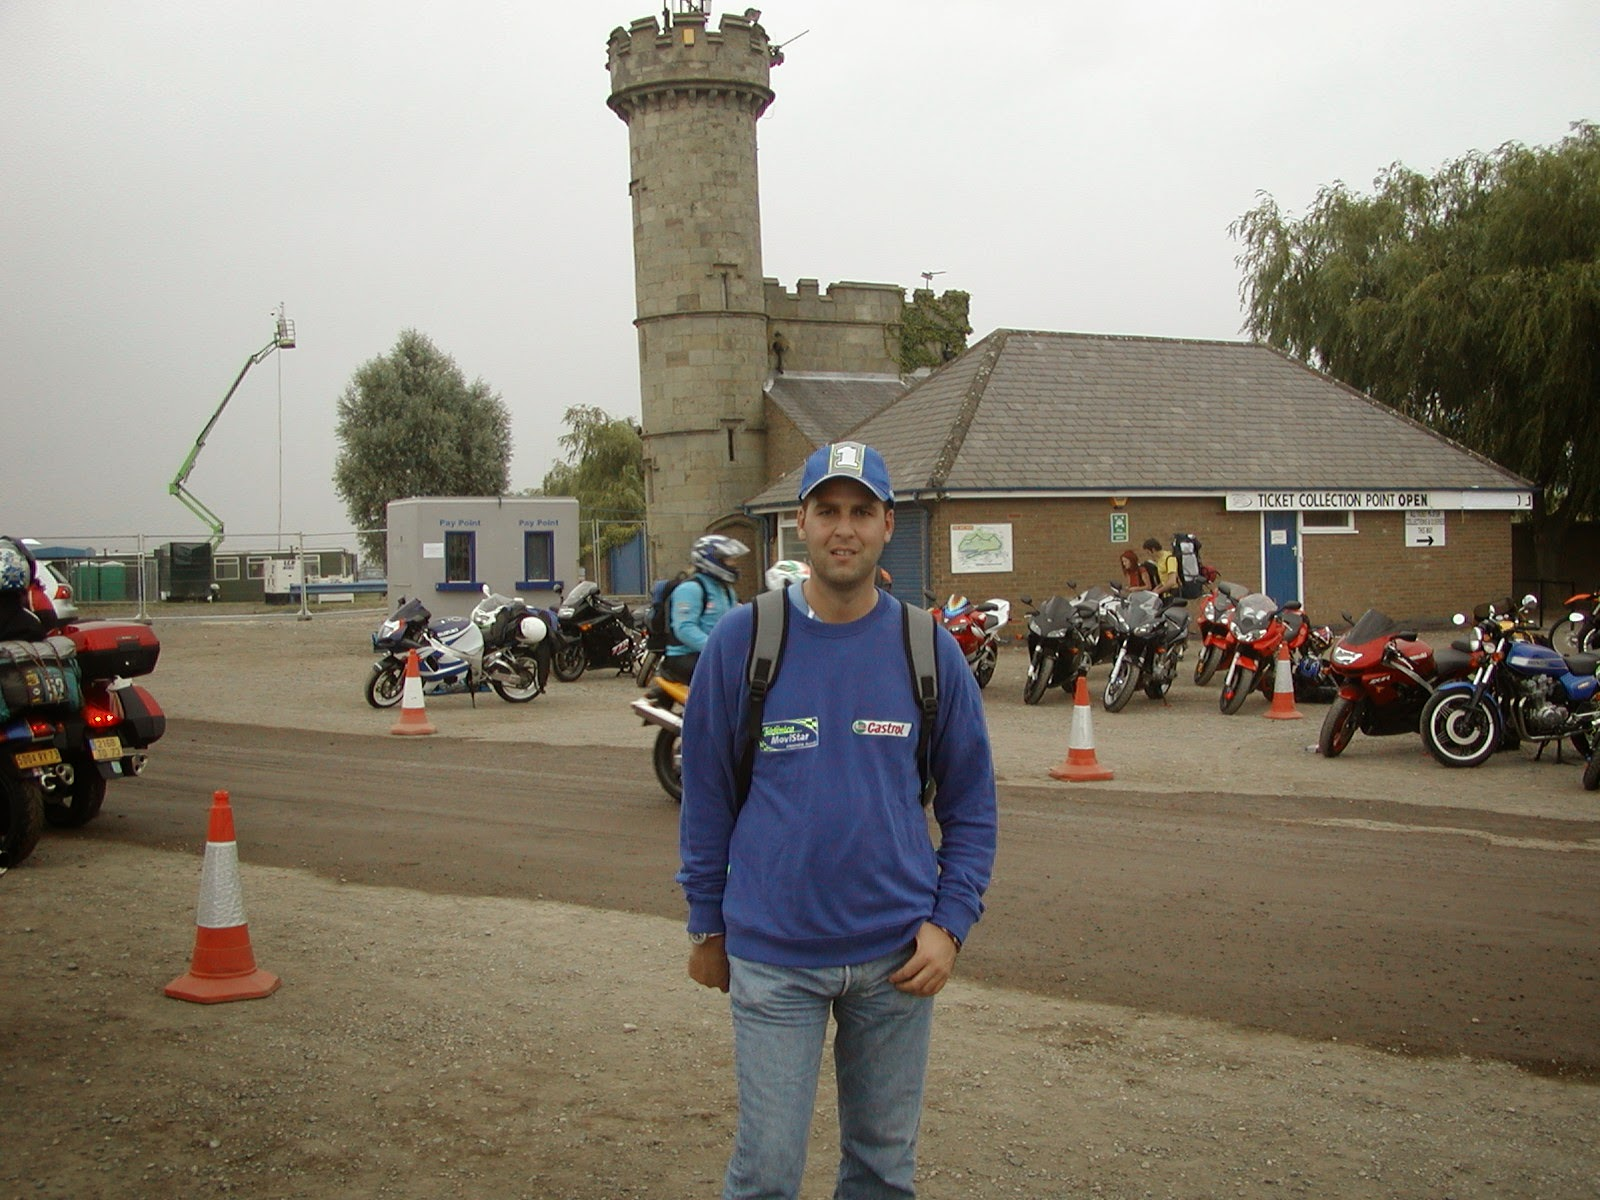 circuito de donington park en Reino Unido